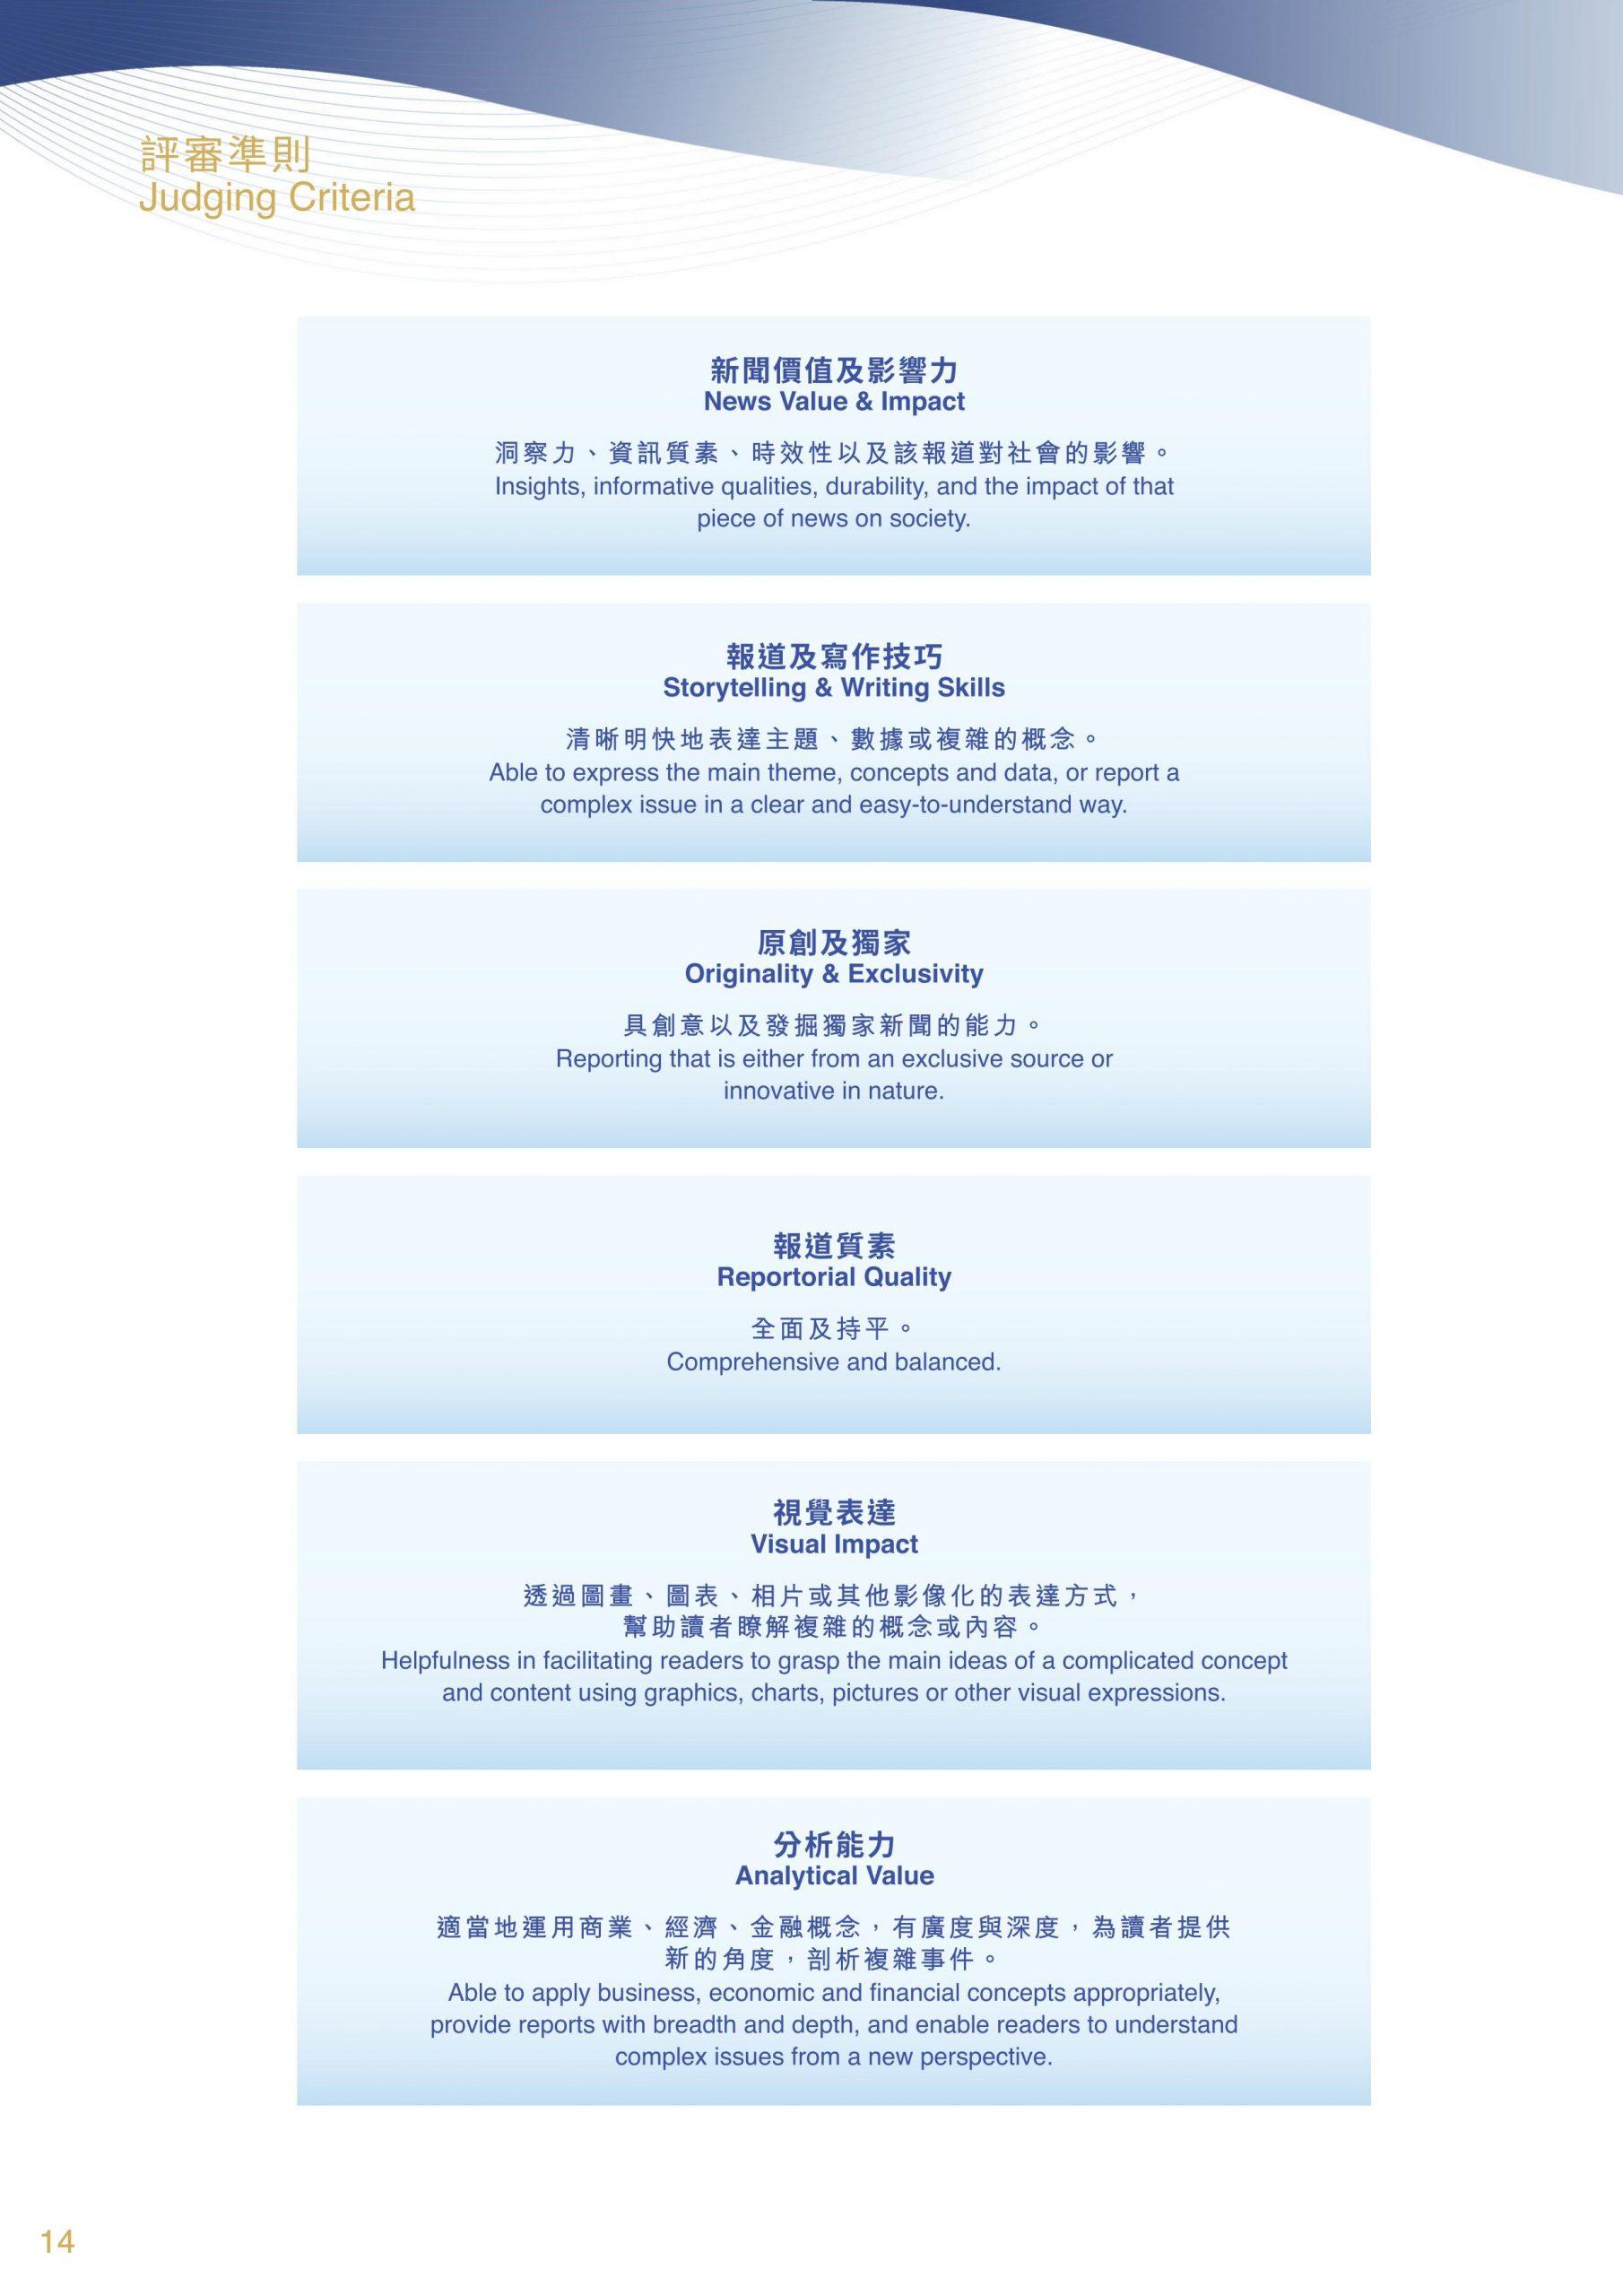 [:hk]第五屆恒大商業新聞獎評審準則[:en]THE 5TH BUSINESS JOURNALISM AWARDS OF HSUHK – JUDGING CRITERIA[:]